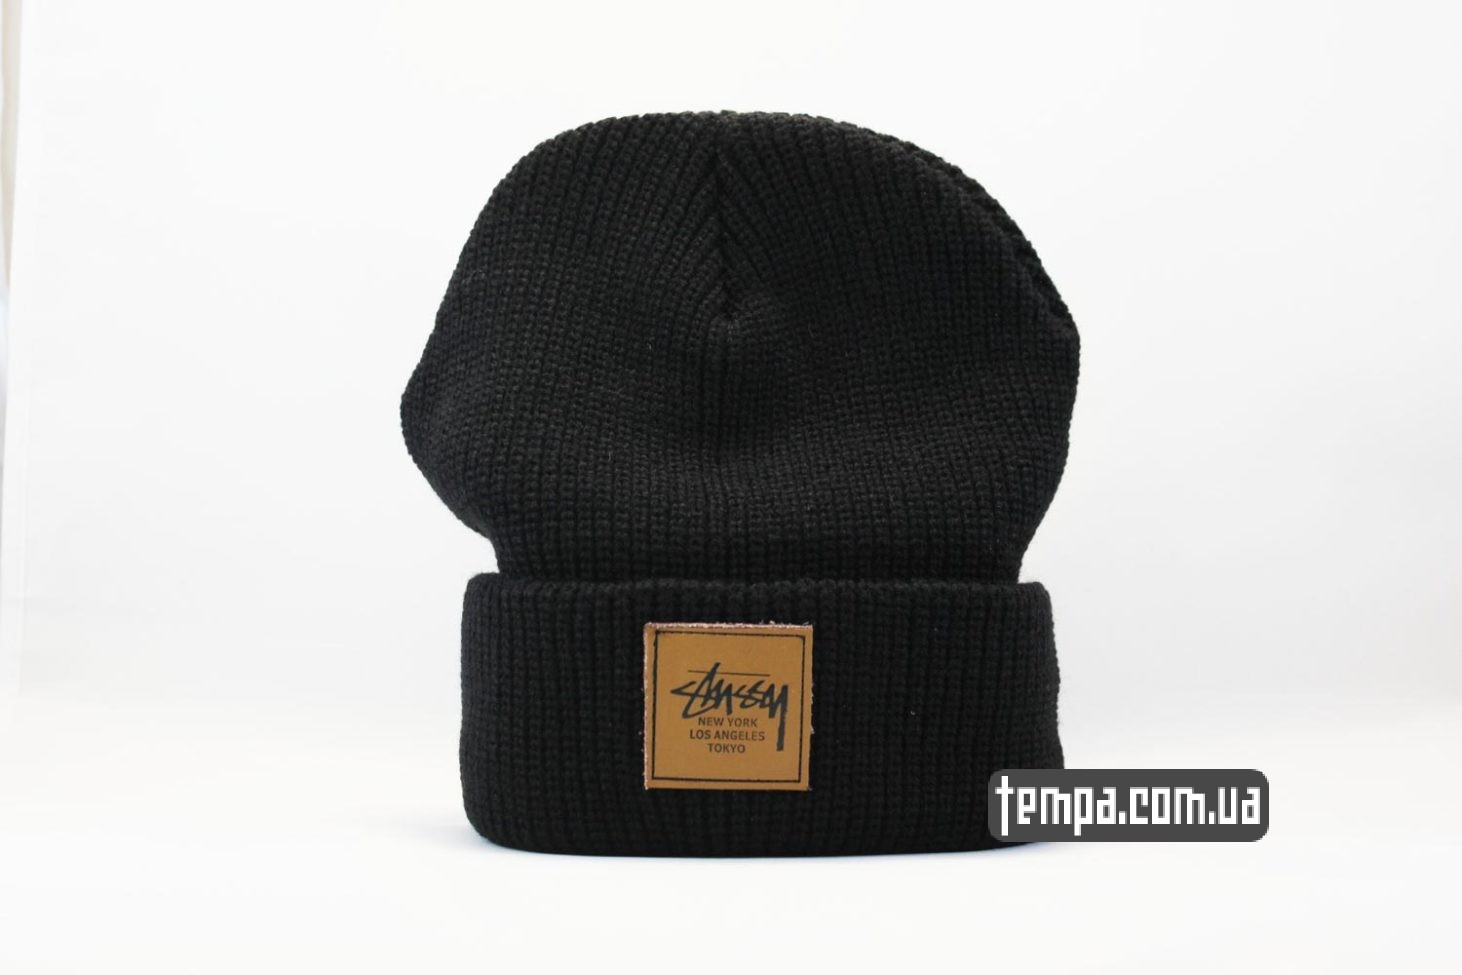 шапка beanie STUSSY New York Los Angeles Tokyo купить магазин Украина